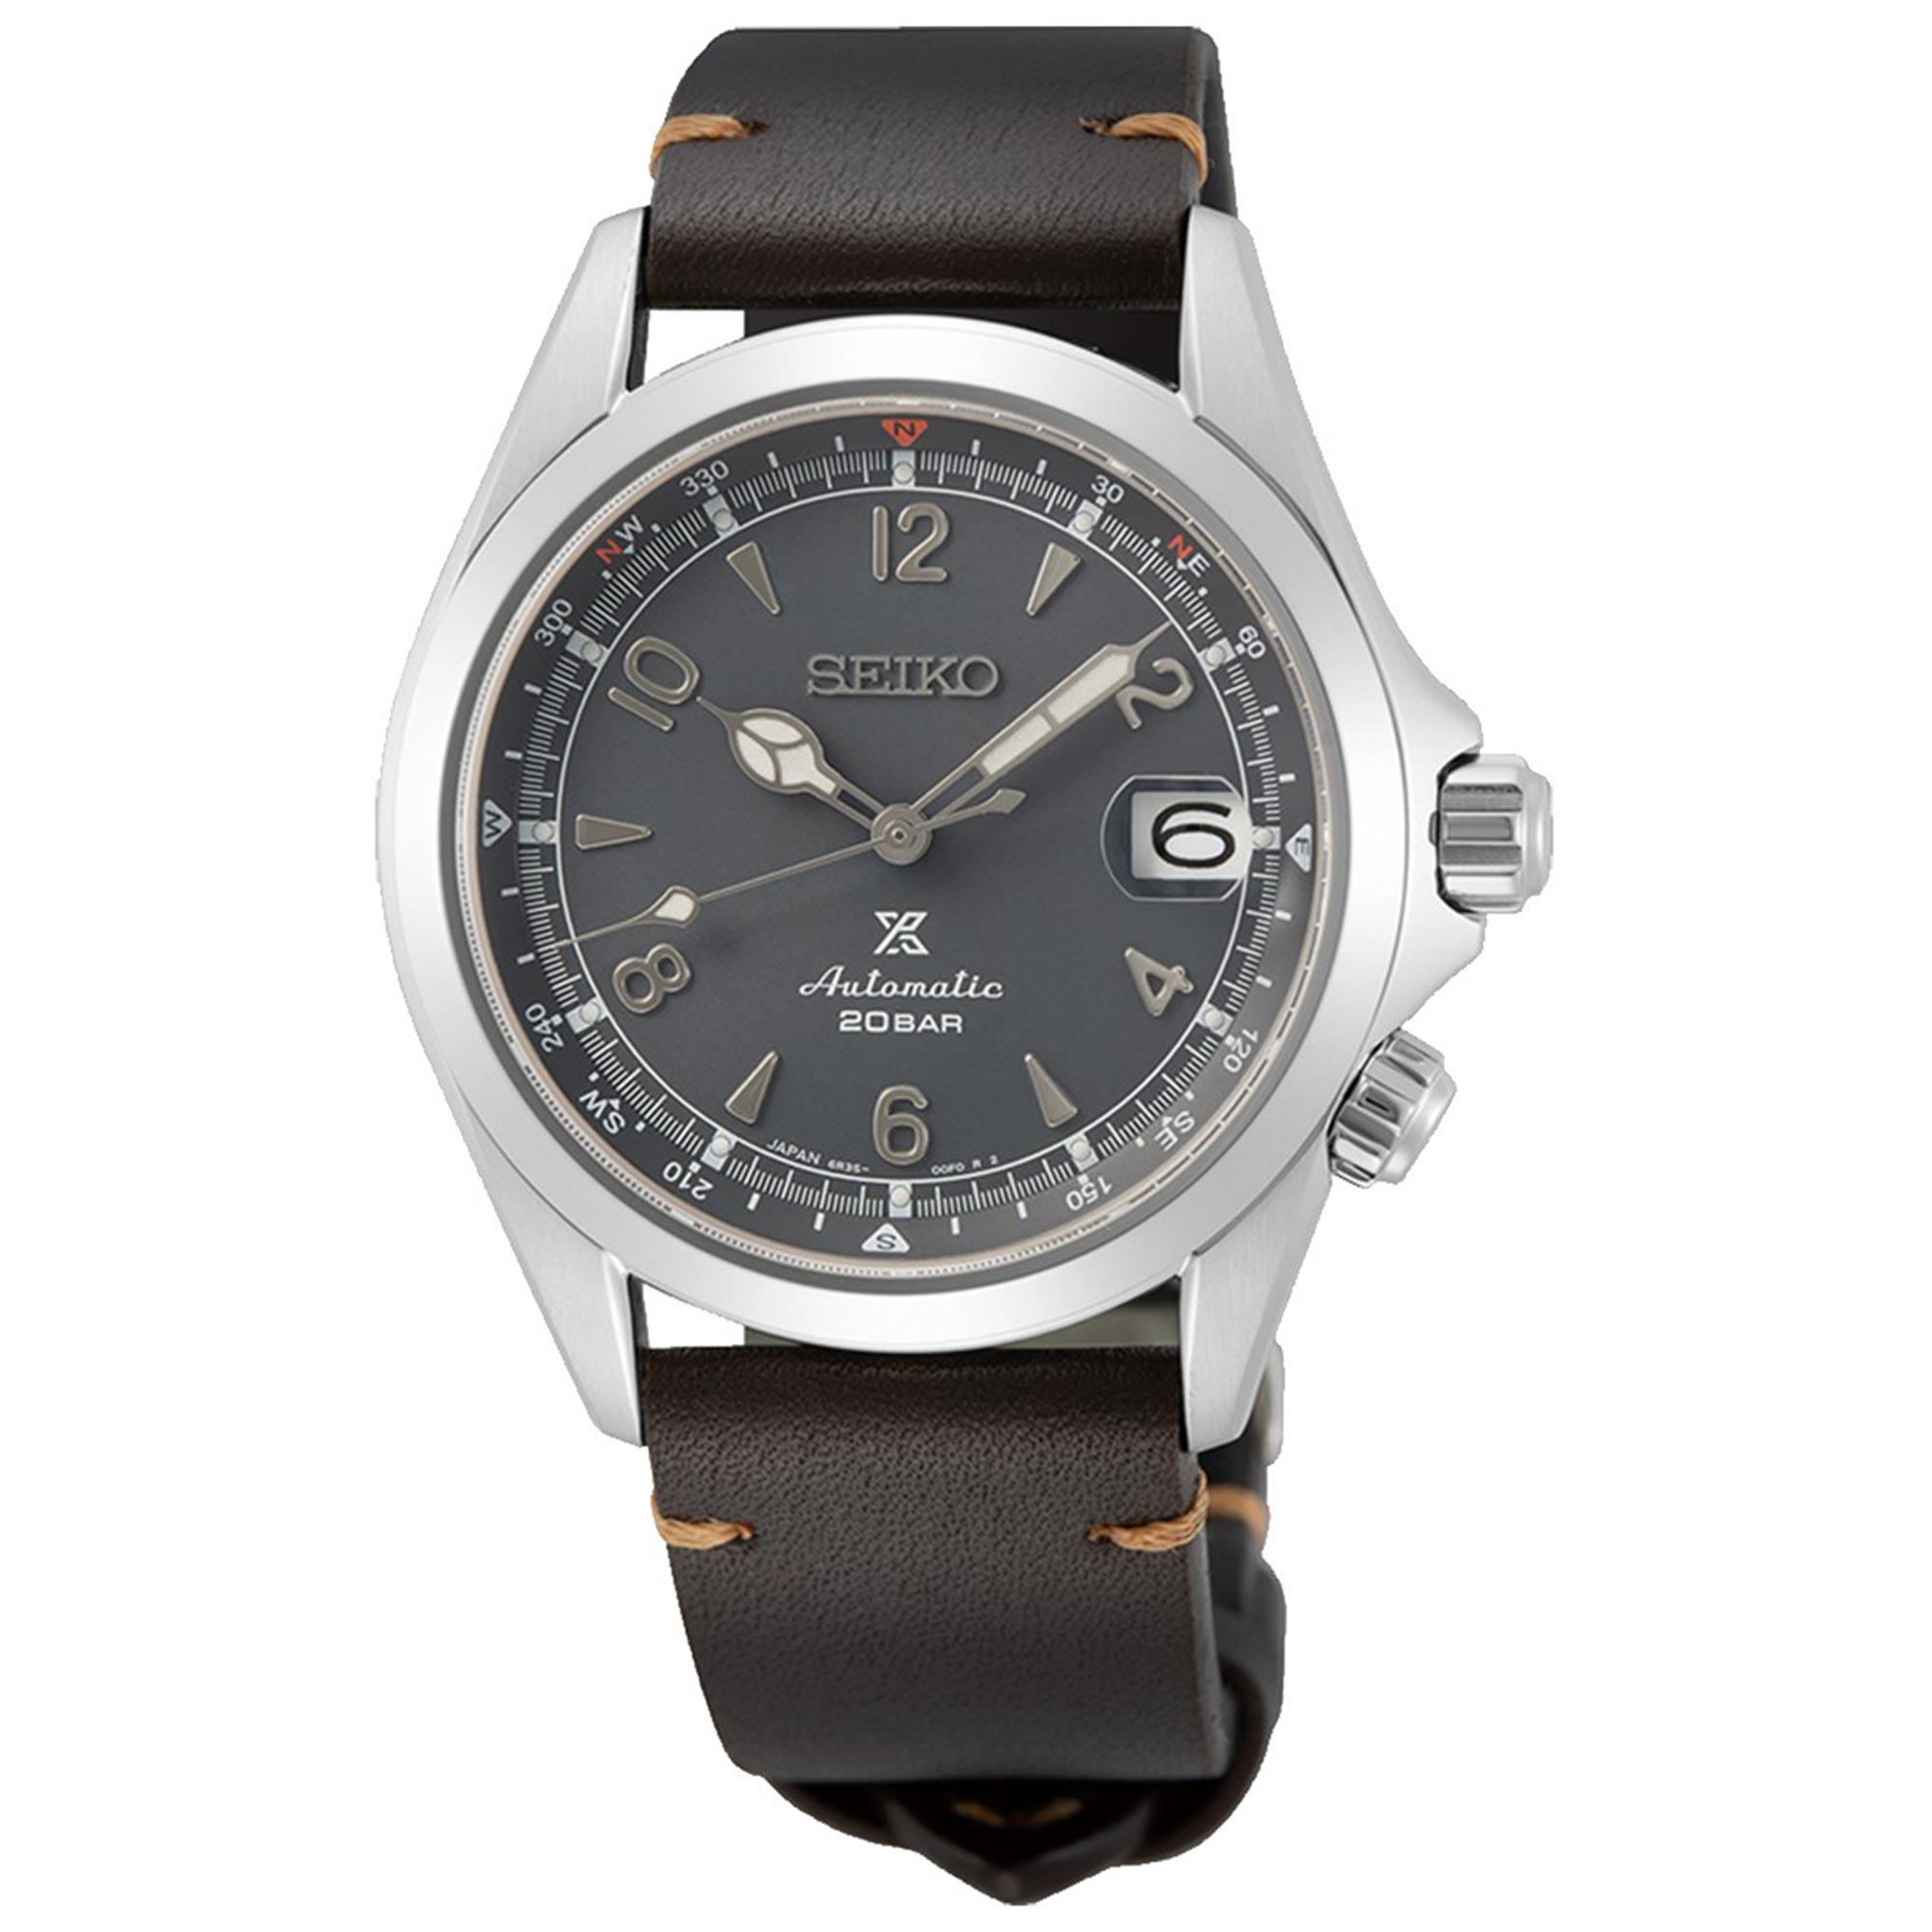 Seiko Prospex Alpinist 2021 European Limited Edition Automatic Grey Dial Brown Leather Strap Men's Watch SPB201J1